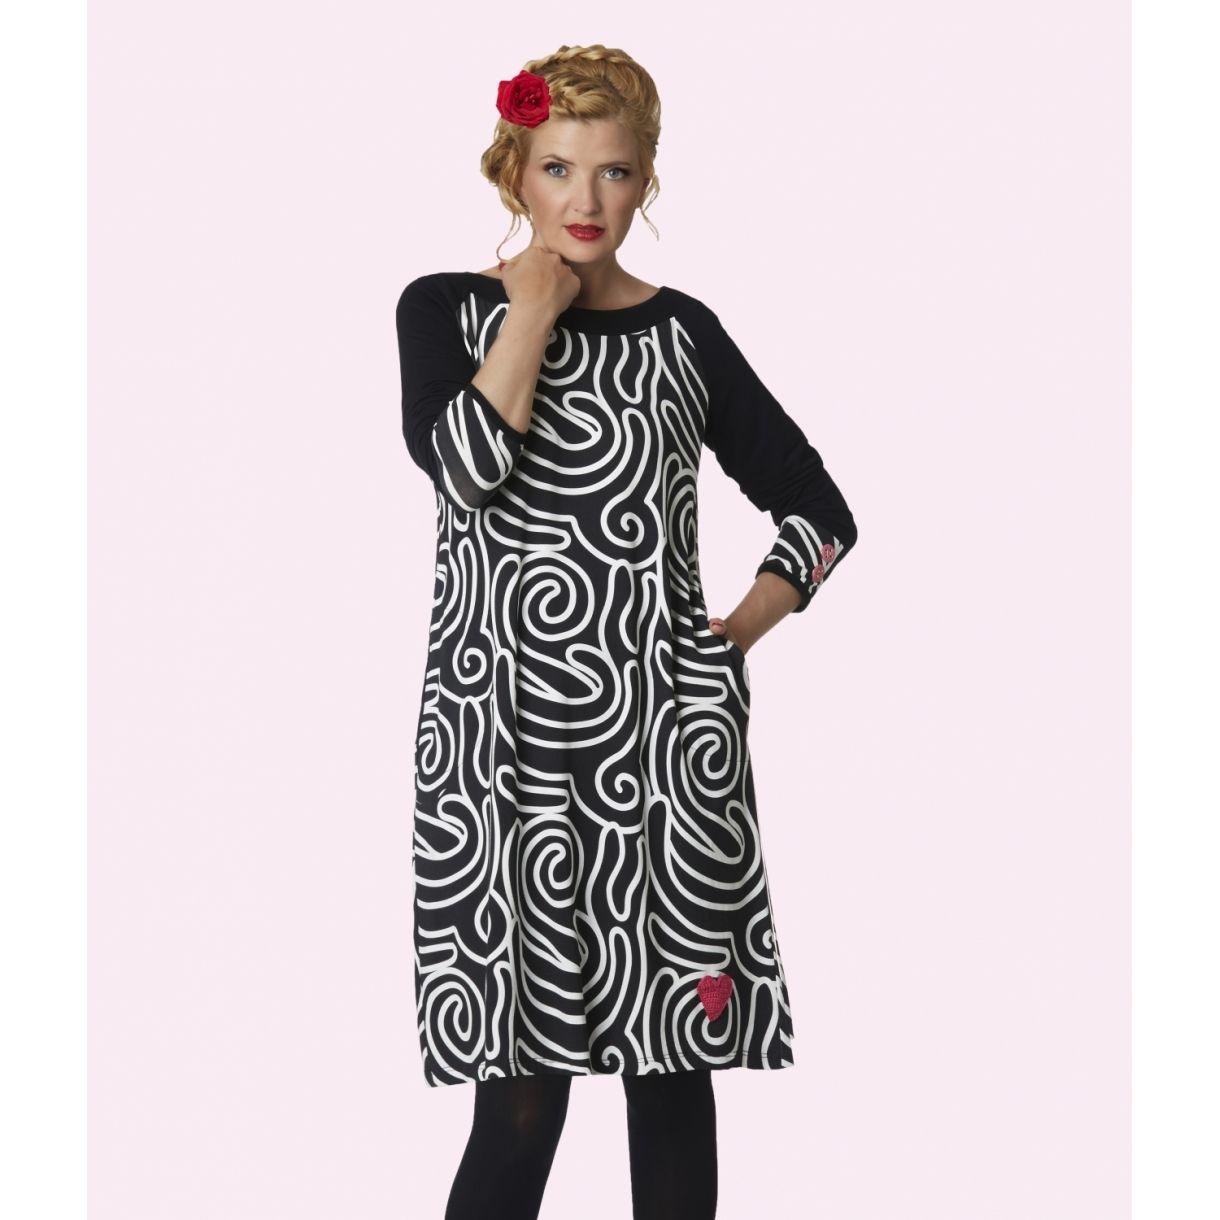 ella Elastica Ella Shopping And Elegant Kjoler Kjole ~ Pinterest qxwtzpAC